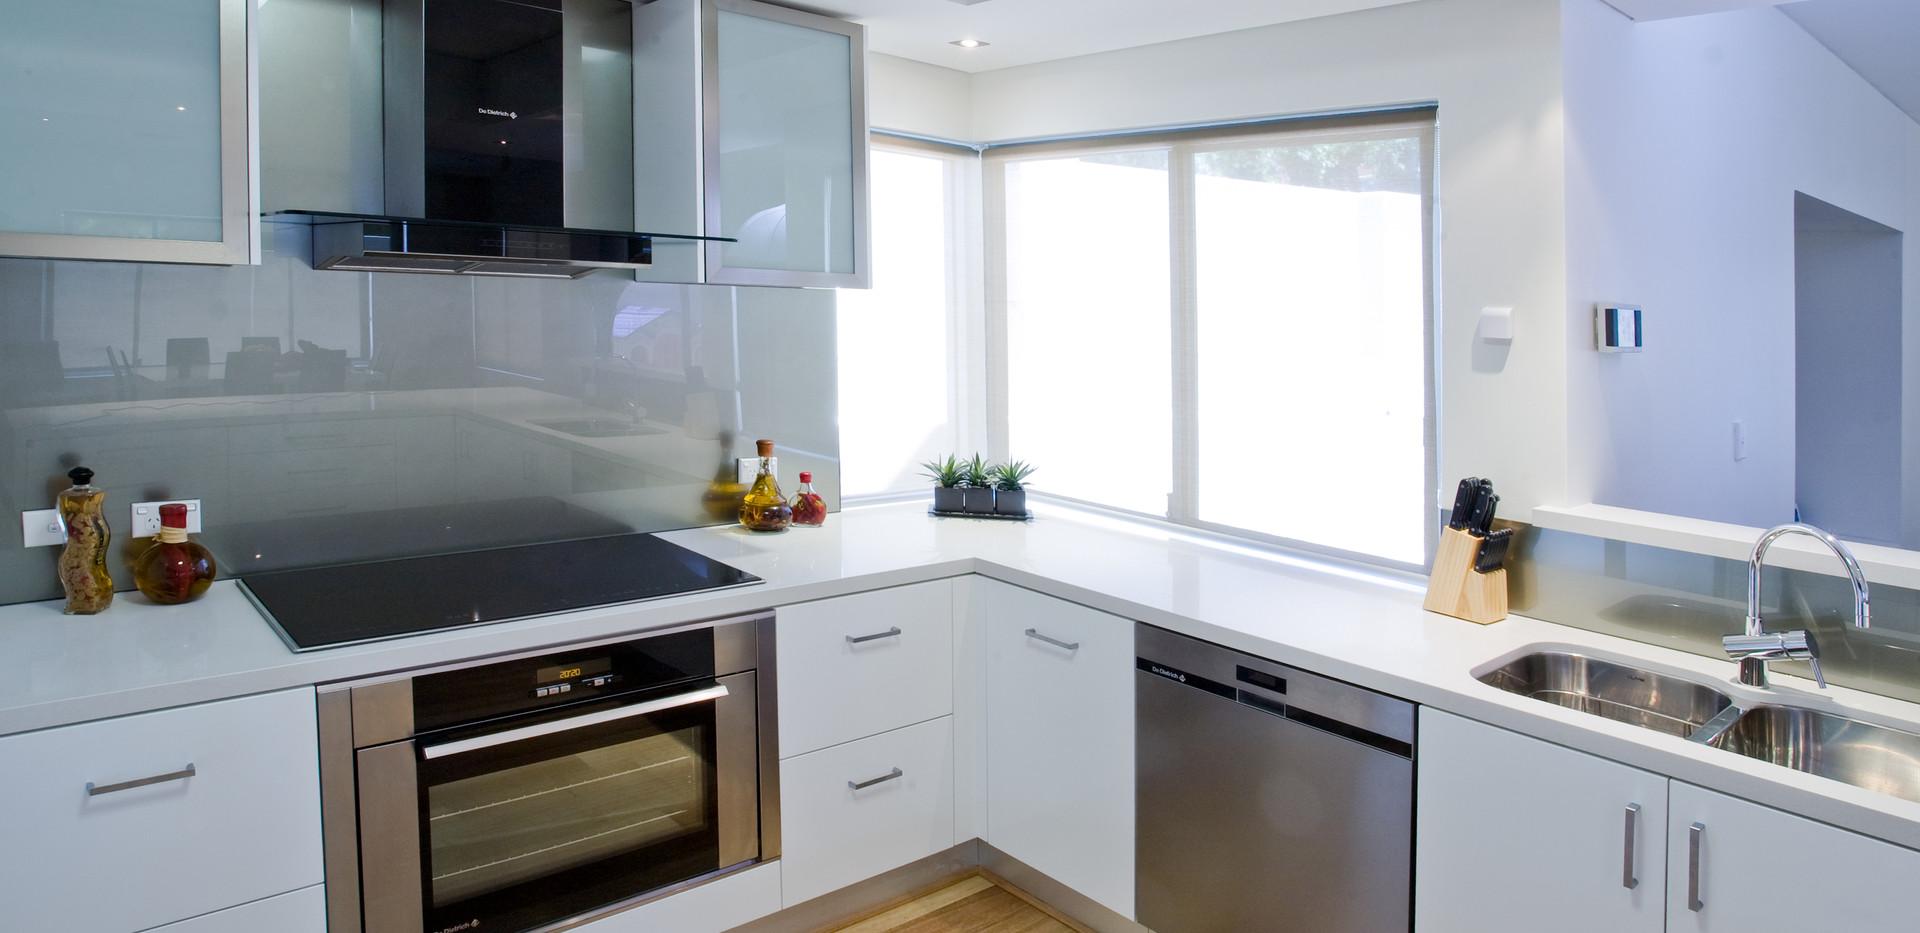 Kitchens_JPEG_000-03.jpg